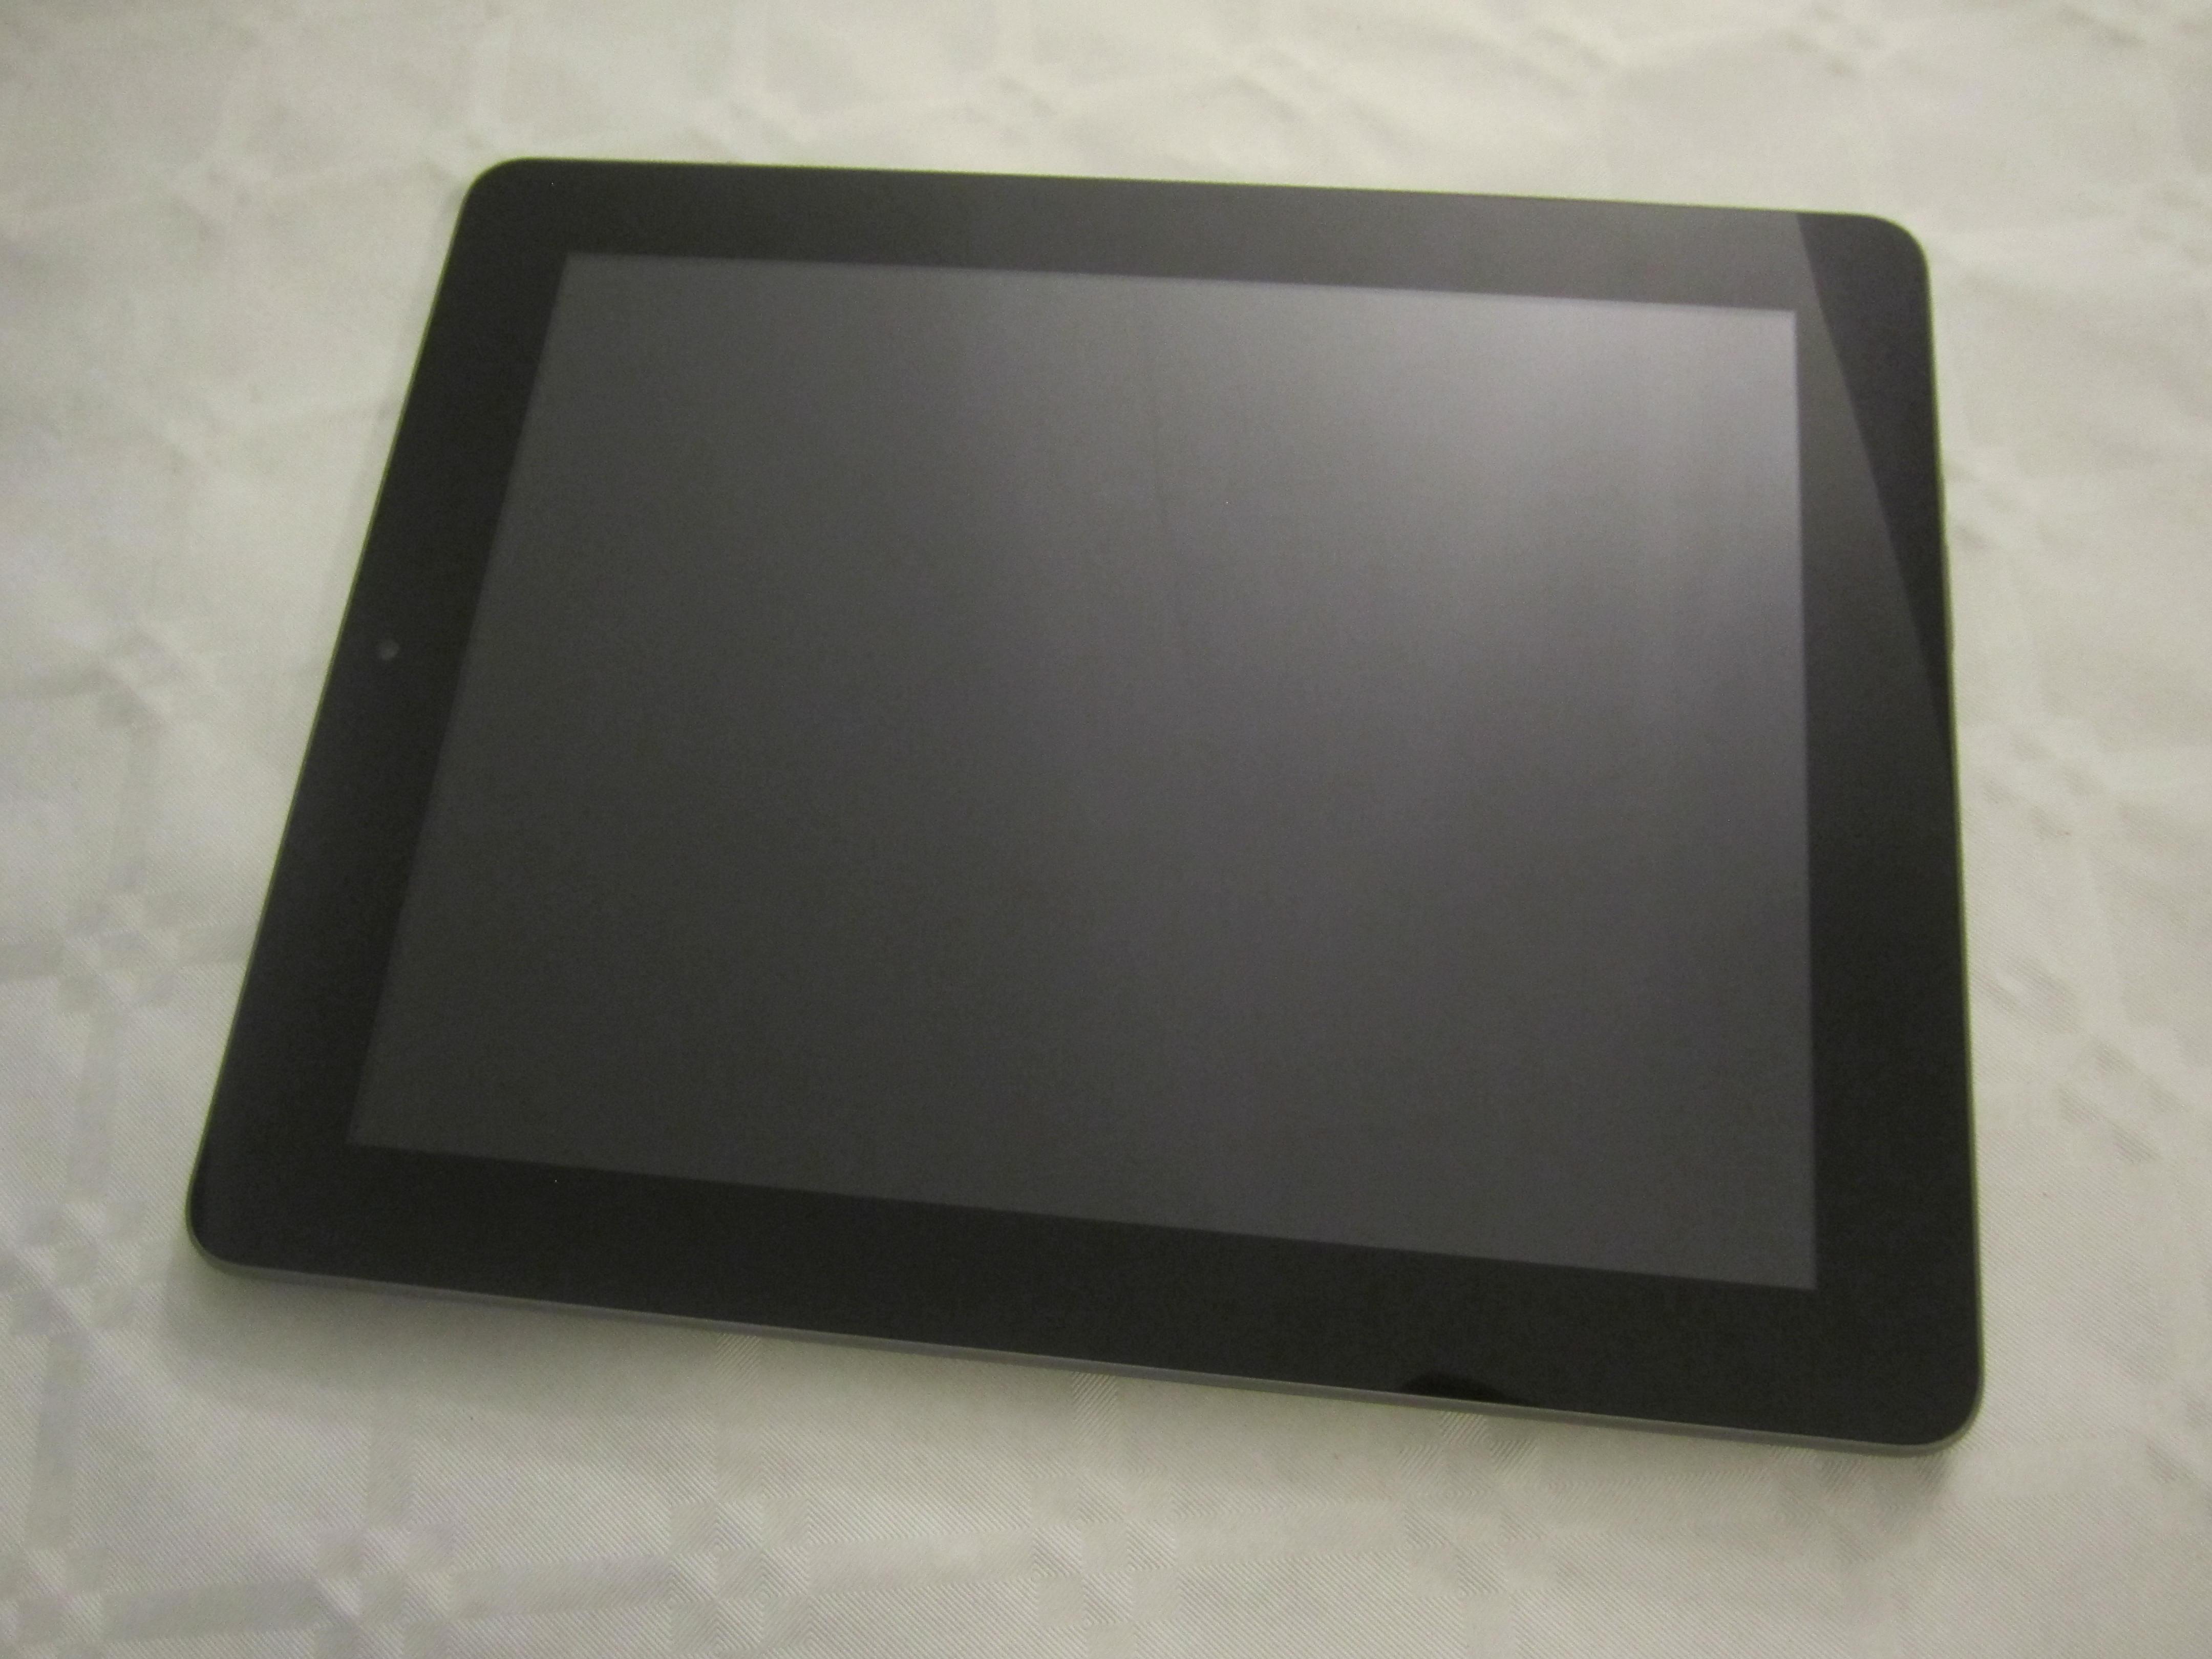 Test de la tablette Memup Slidepad 9716 Elite